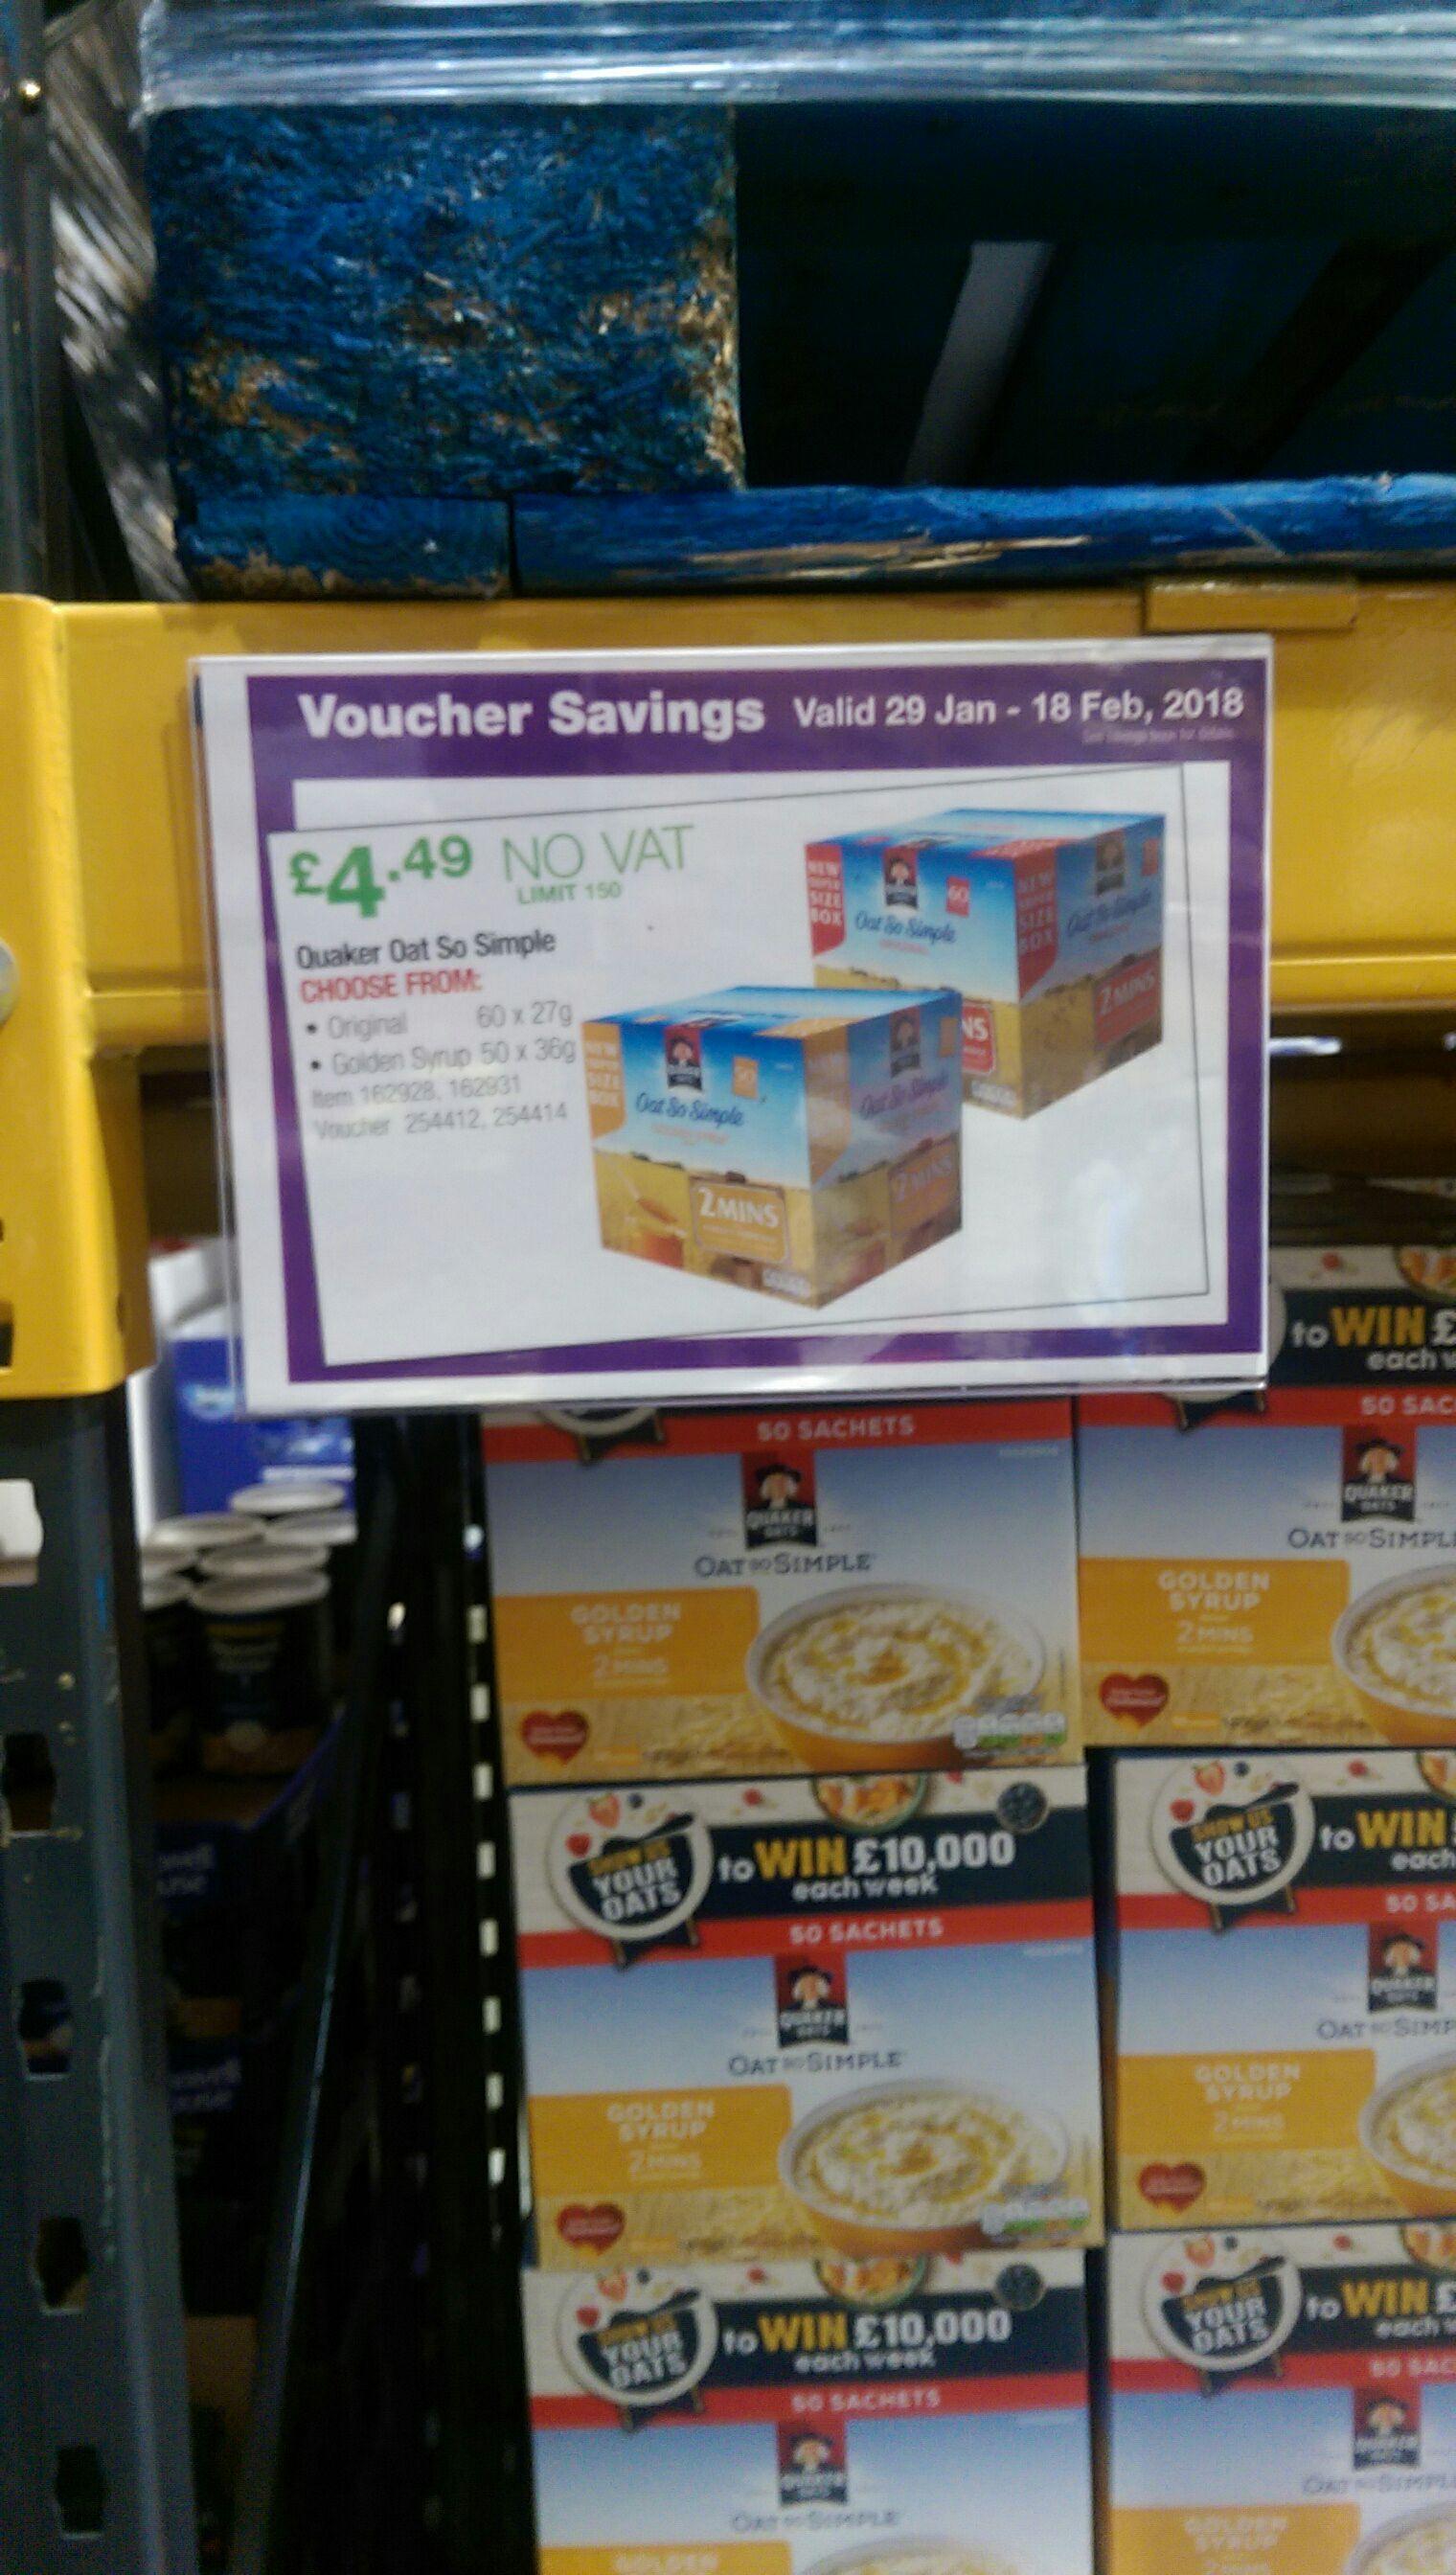 Quaker oats so simple boxes £4.49 no VAT  @Costco ends 18 February